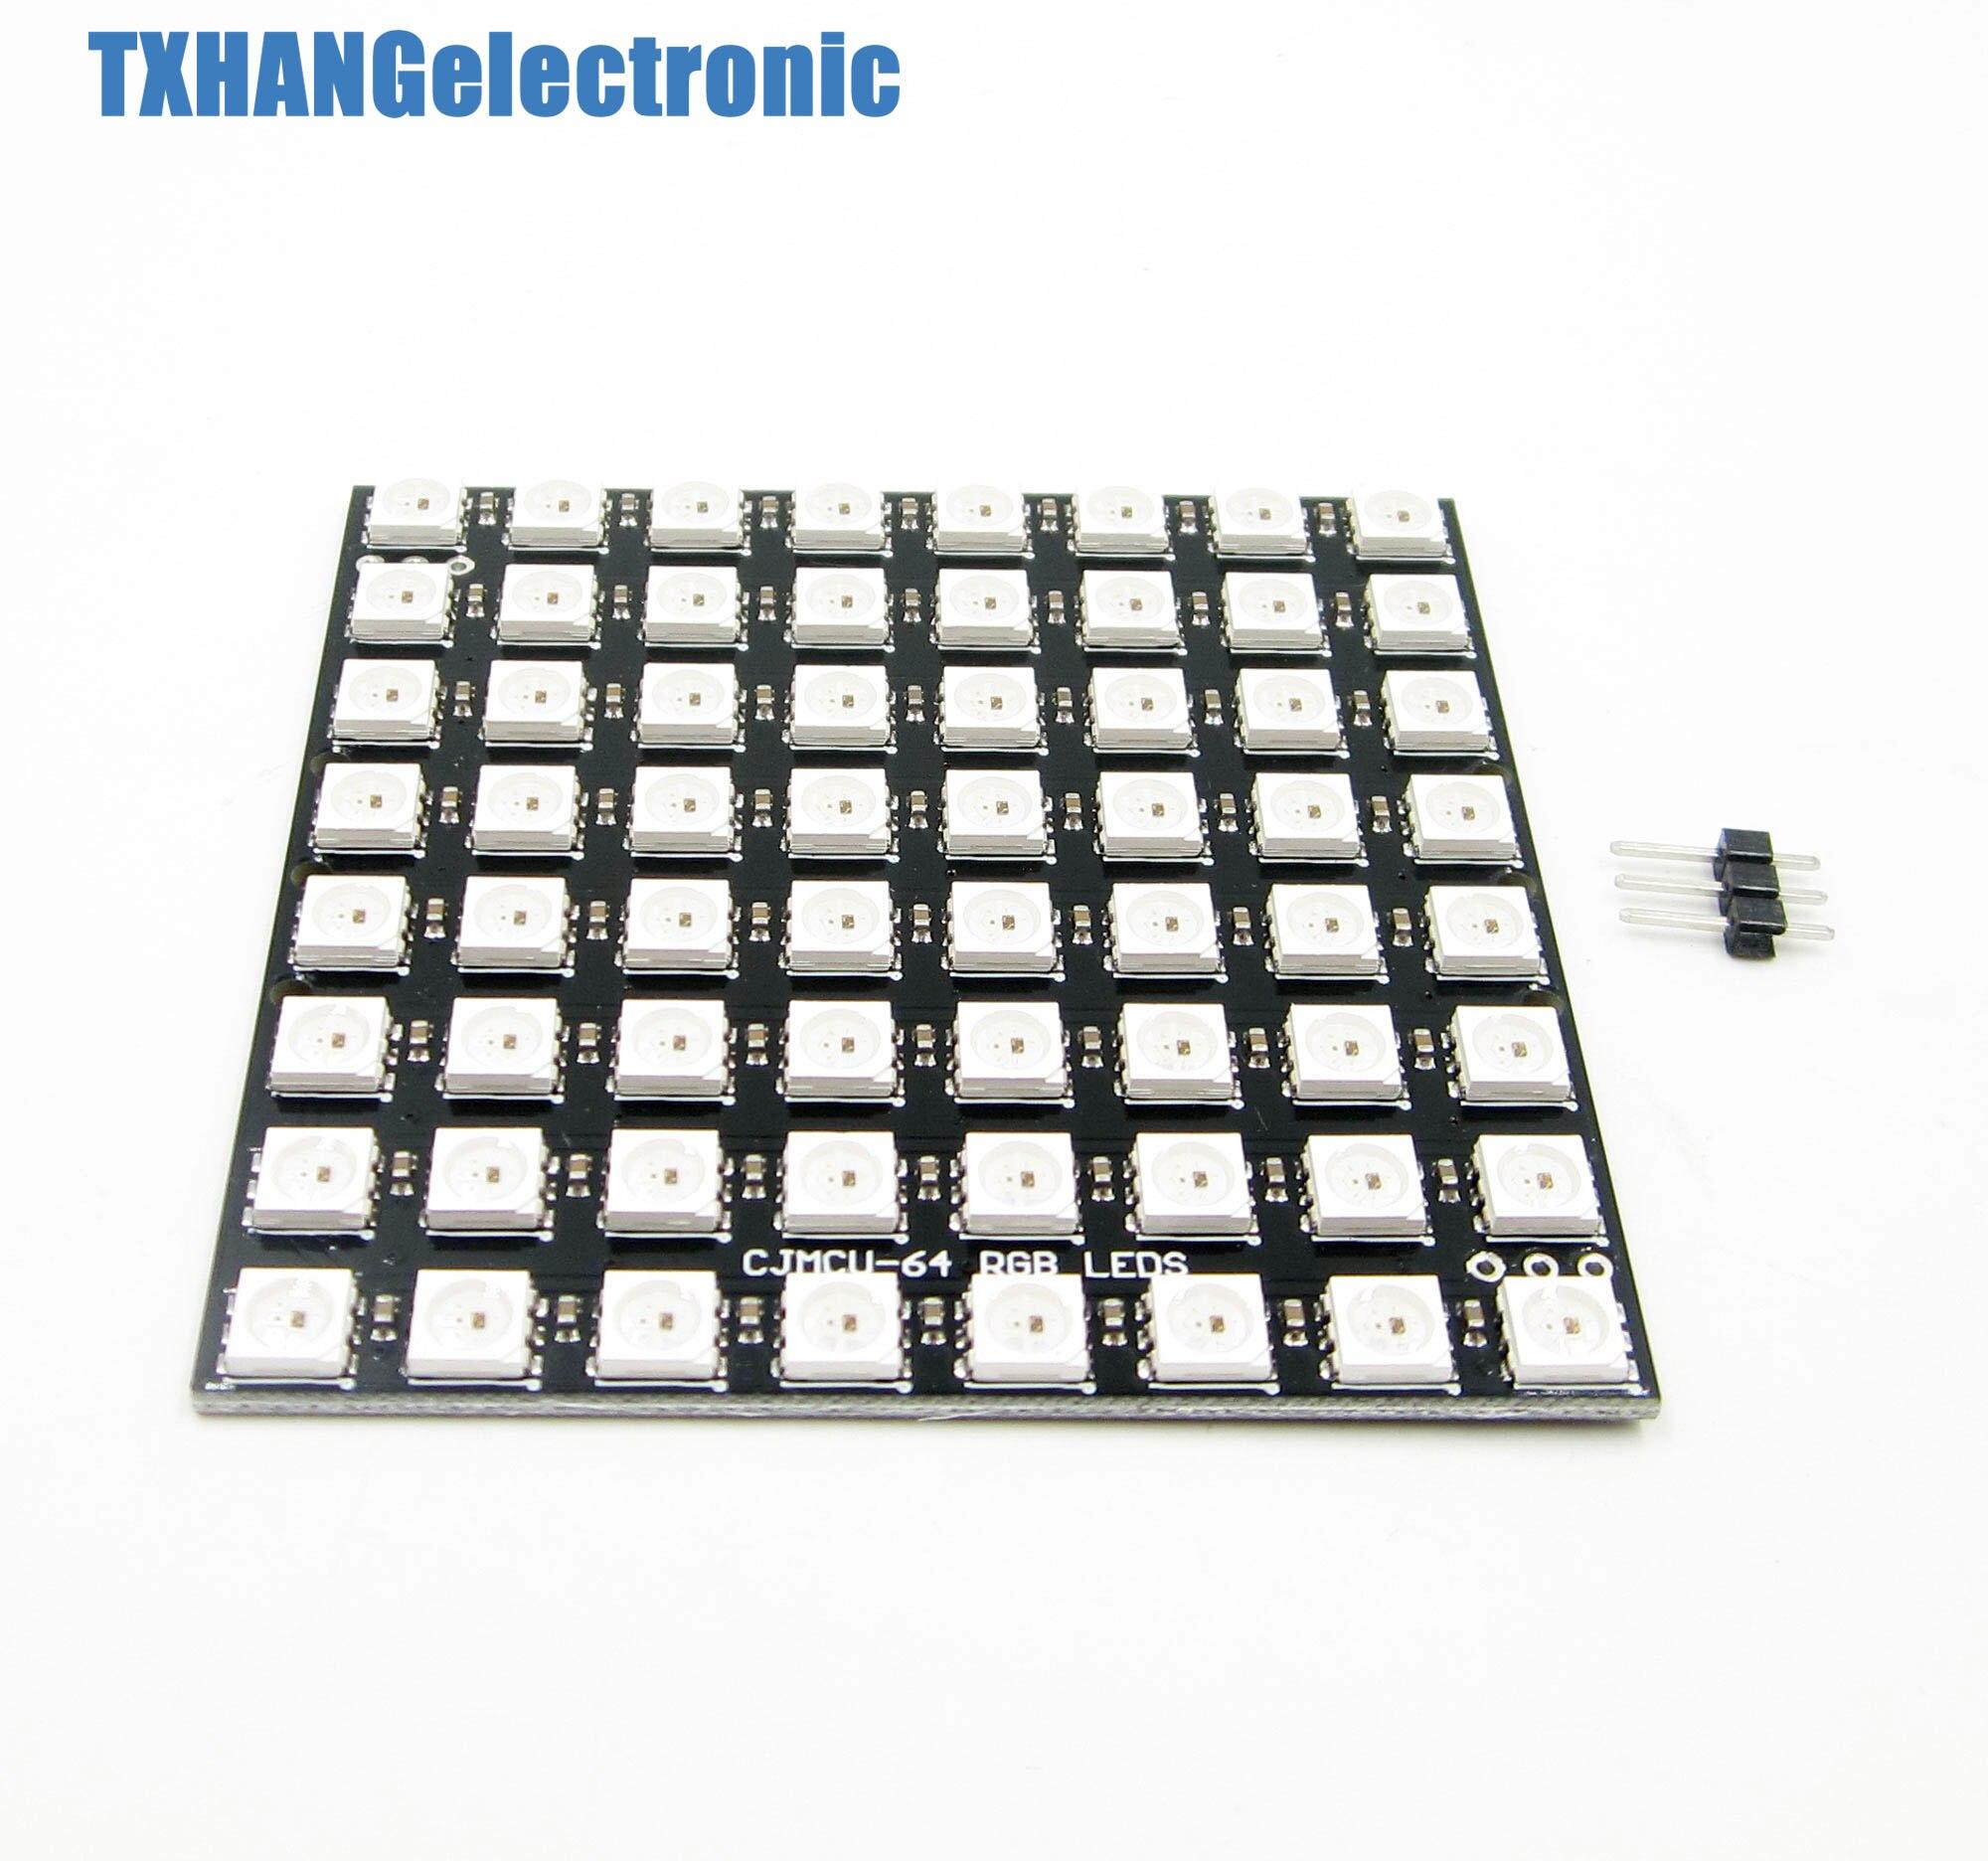 8x8 64 LED Matrix WS2812 LED 5050 RGB Full-Color Driver Board